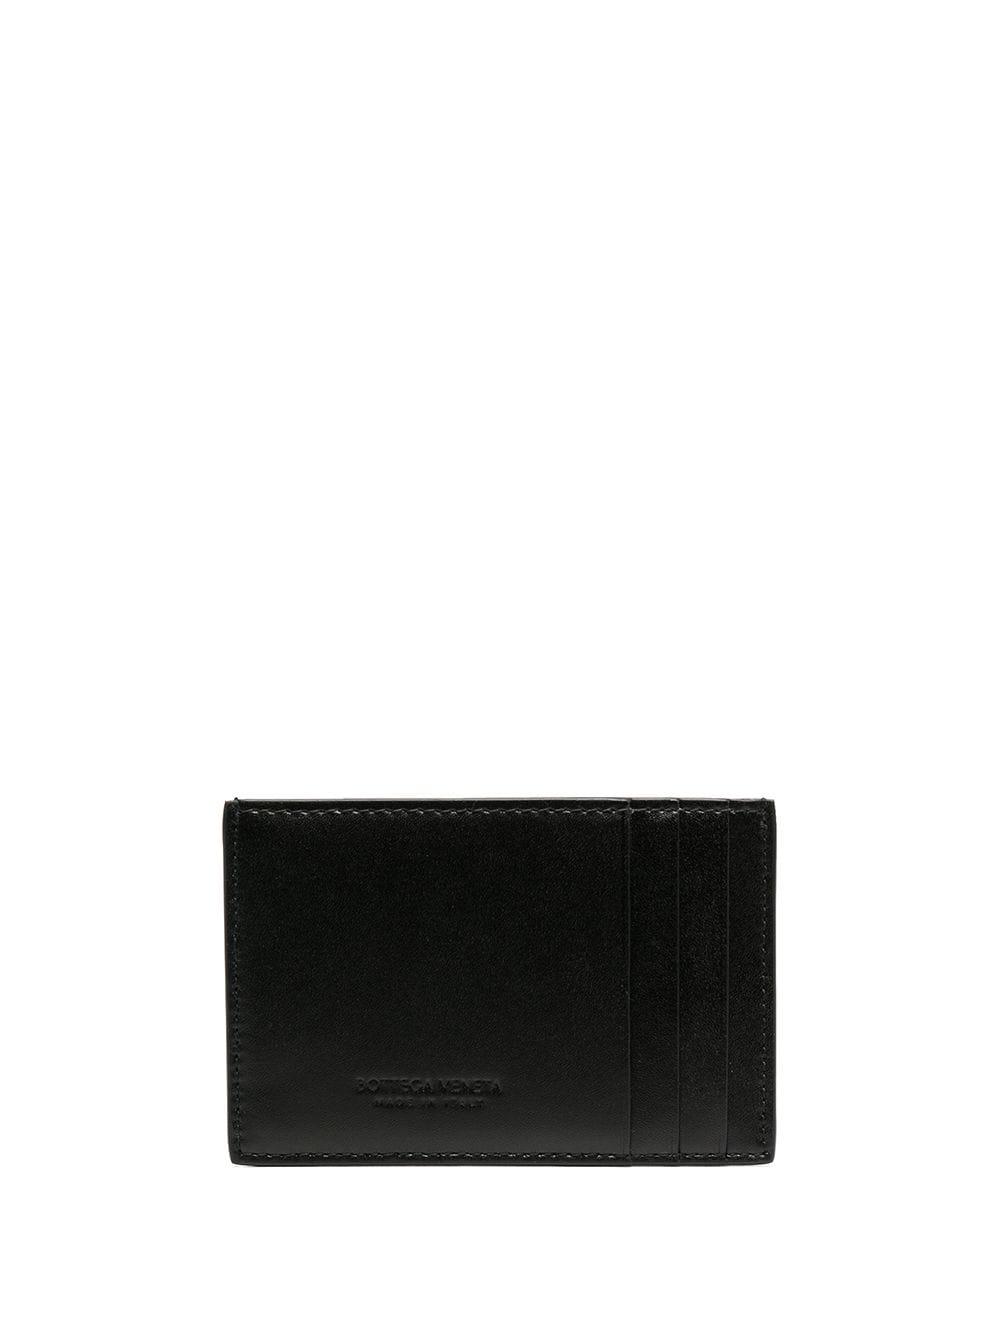 Picture of Bottega Veneta | Intrecciato Cardholder